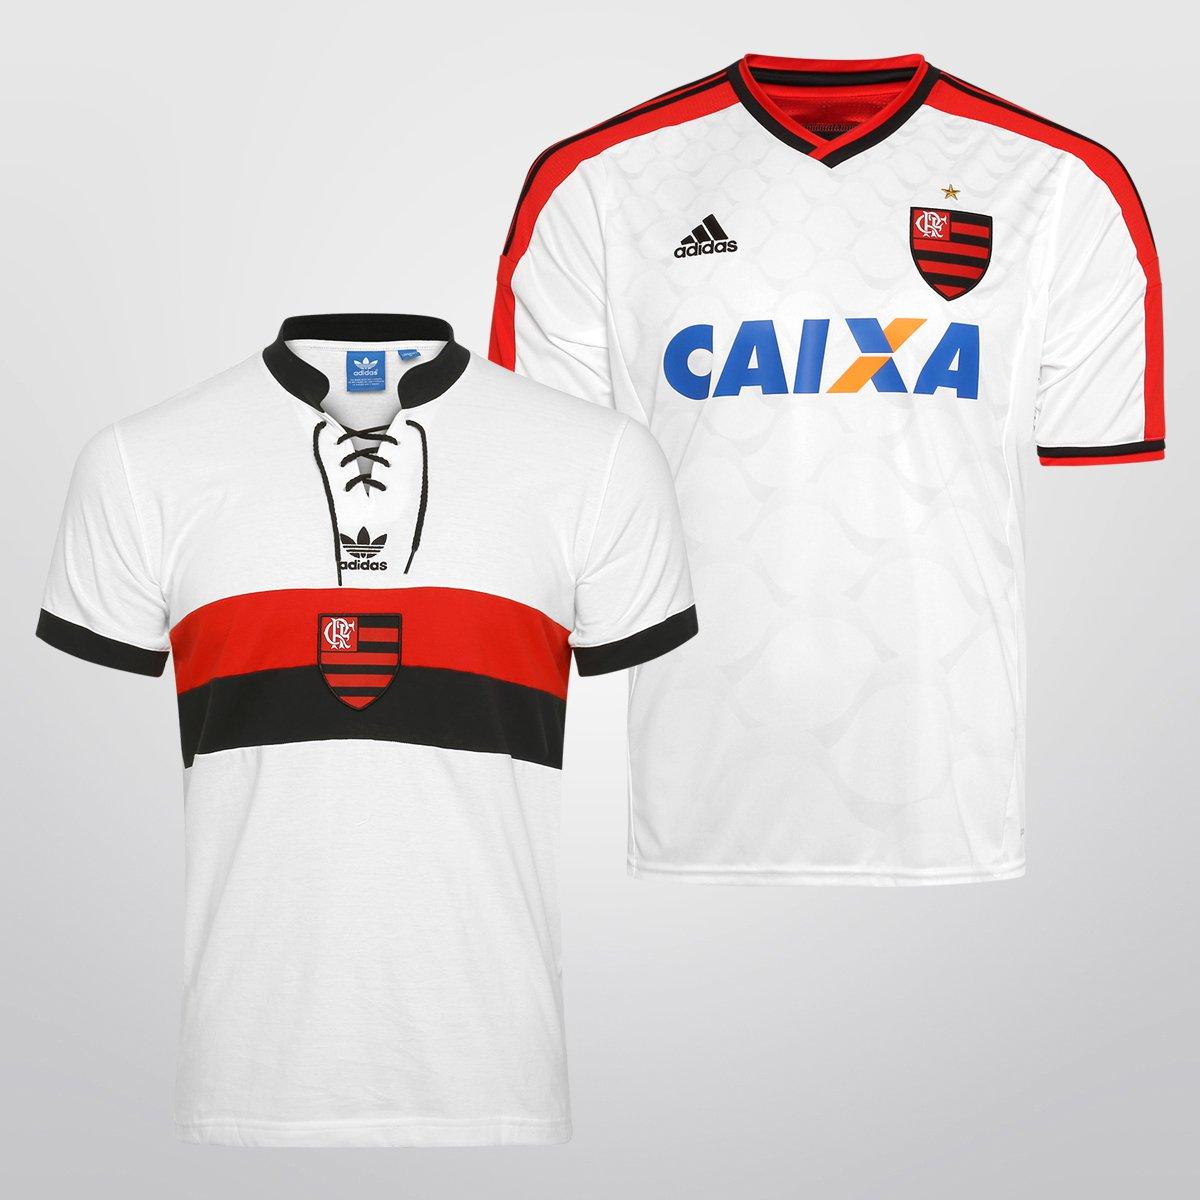 Kit Adidas Flamengo - Camisa II 14 15 + Camisa Retrô - Compre Agora ... bb723c53decd3